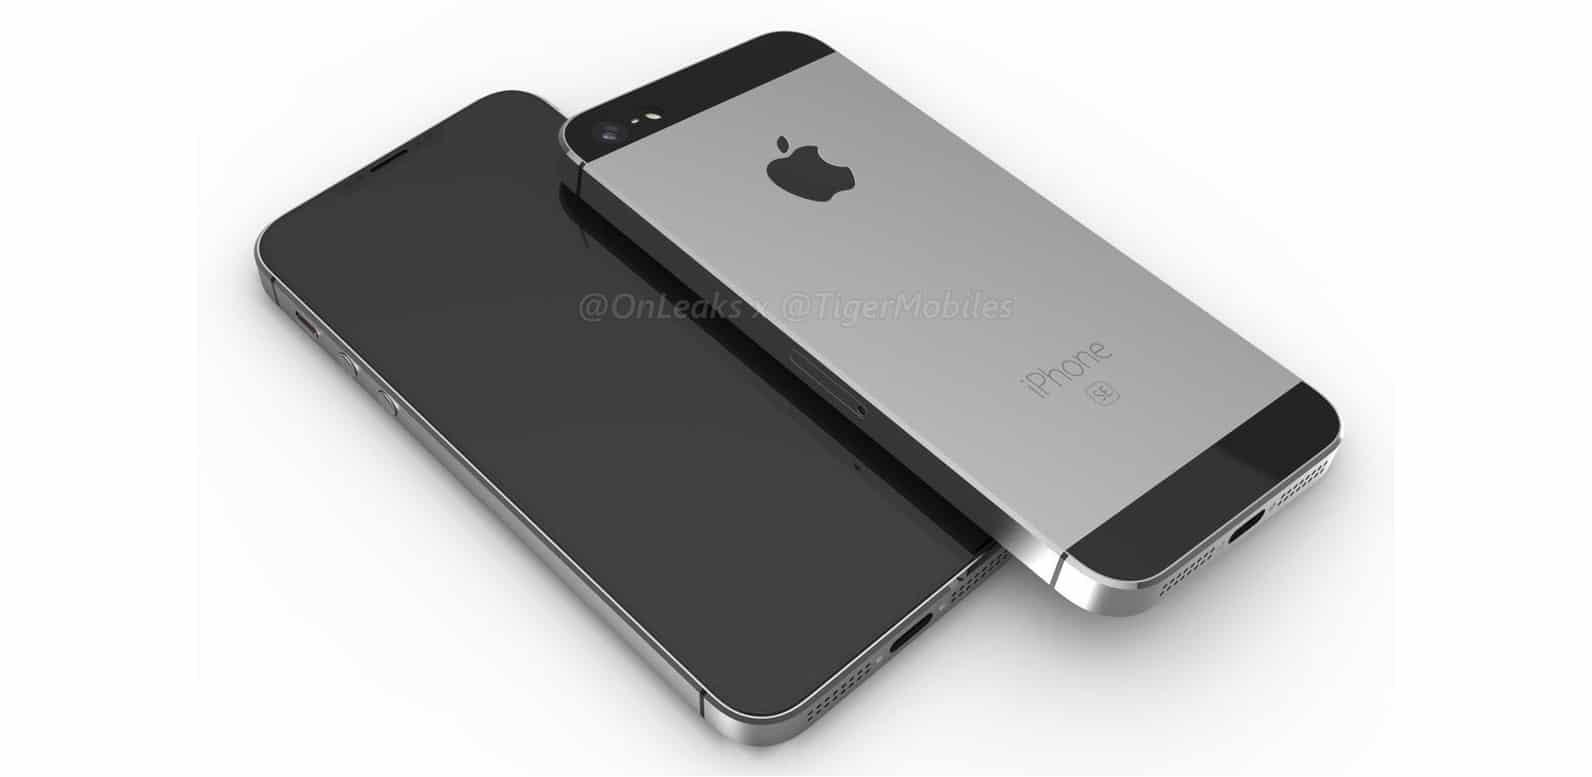 2018 iPhone SE render